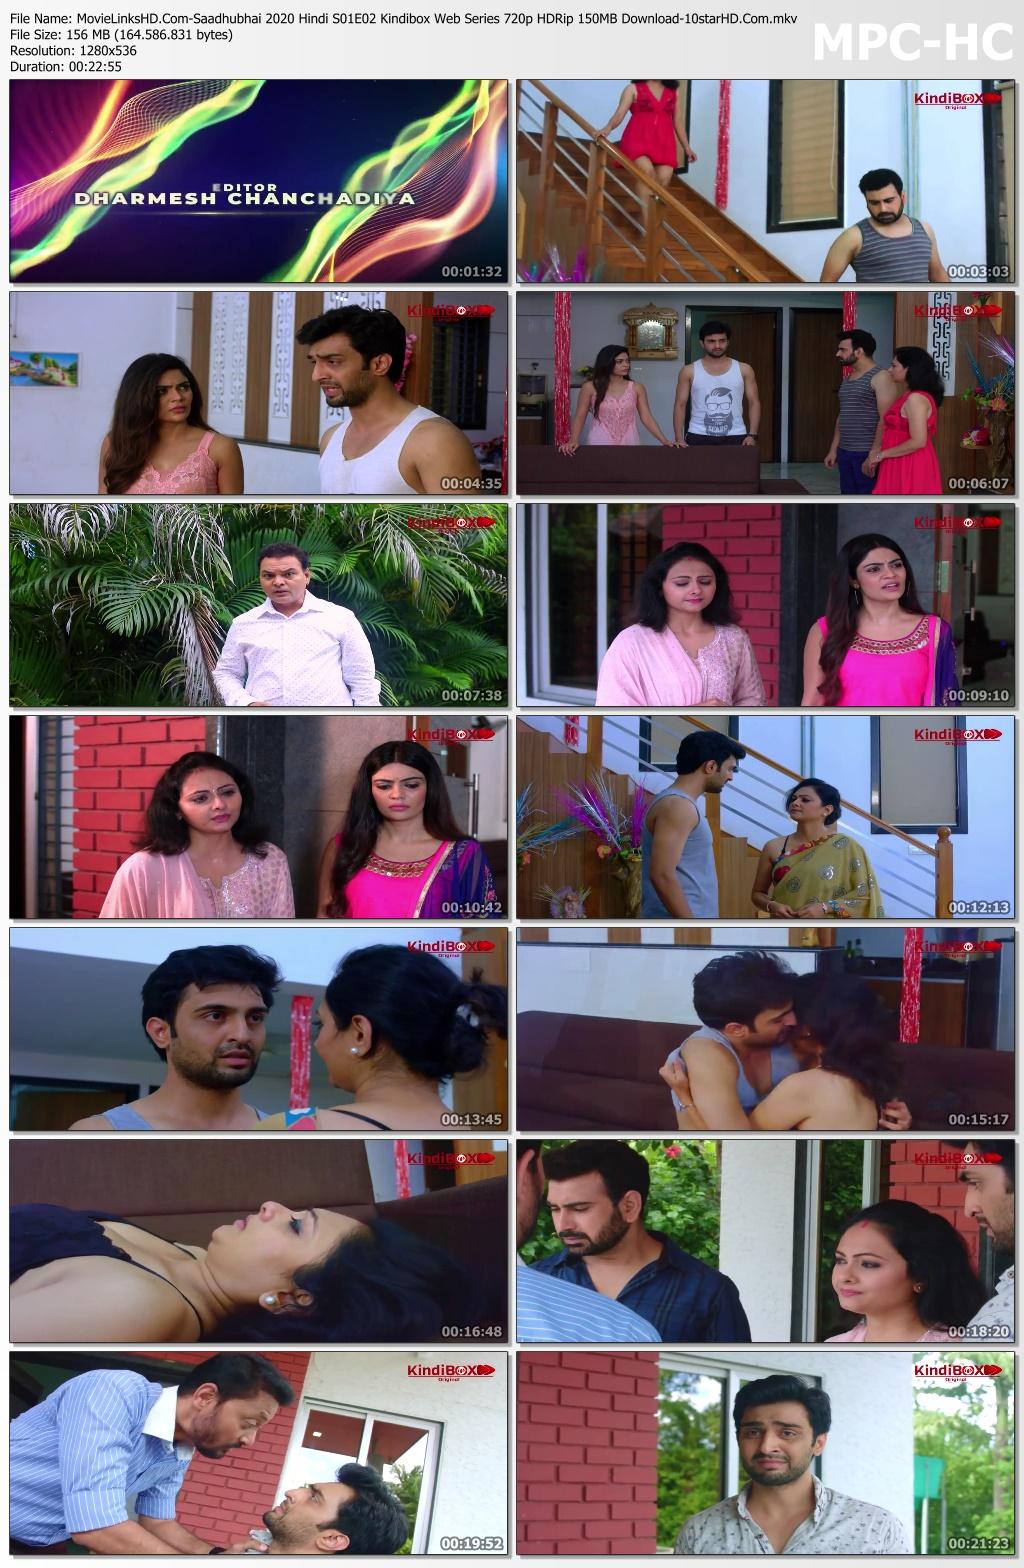 Movie-Links-HD-Com-Saadhubhai-2020-Hindi-S01-E02-Kindibox-Web-Series-720p-HDRip-150-MB-Download-10st